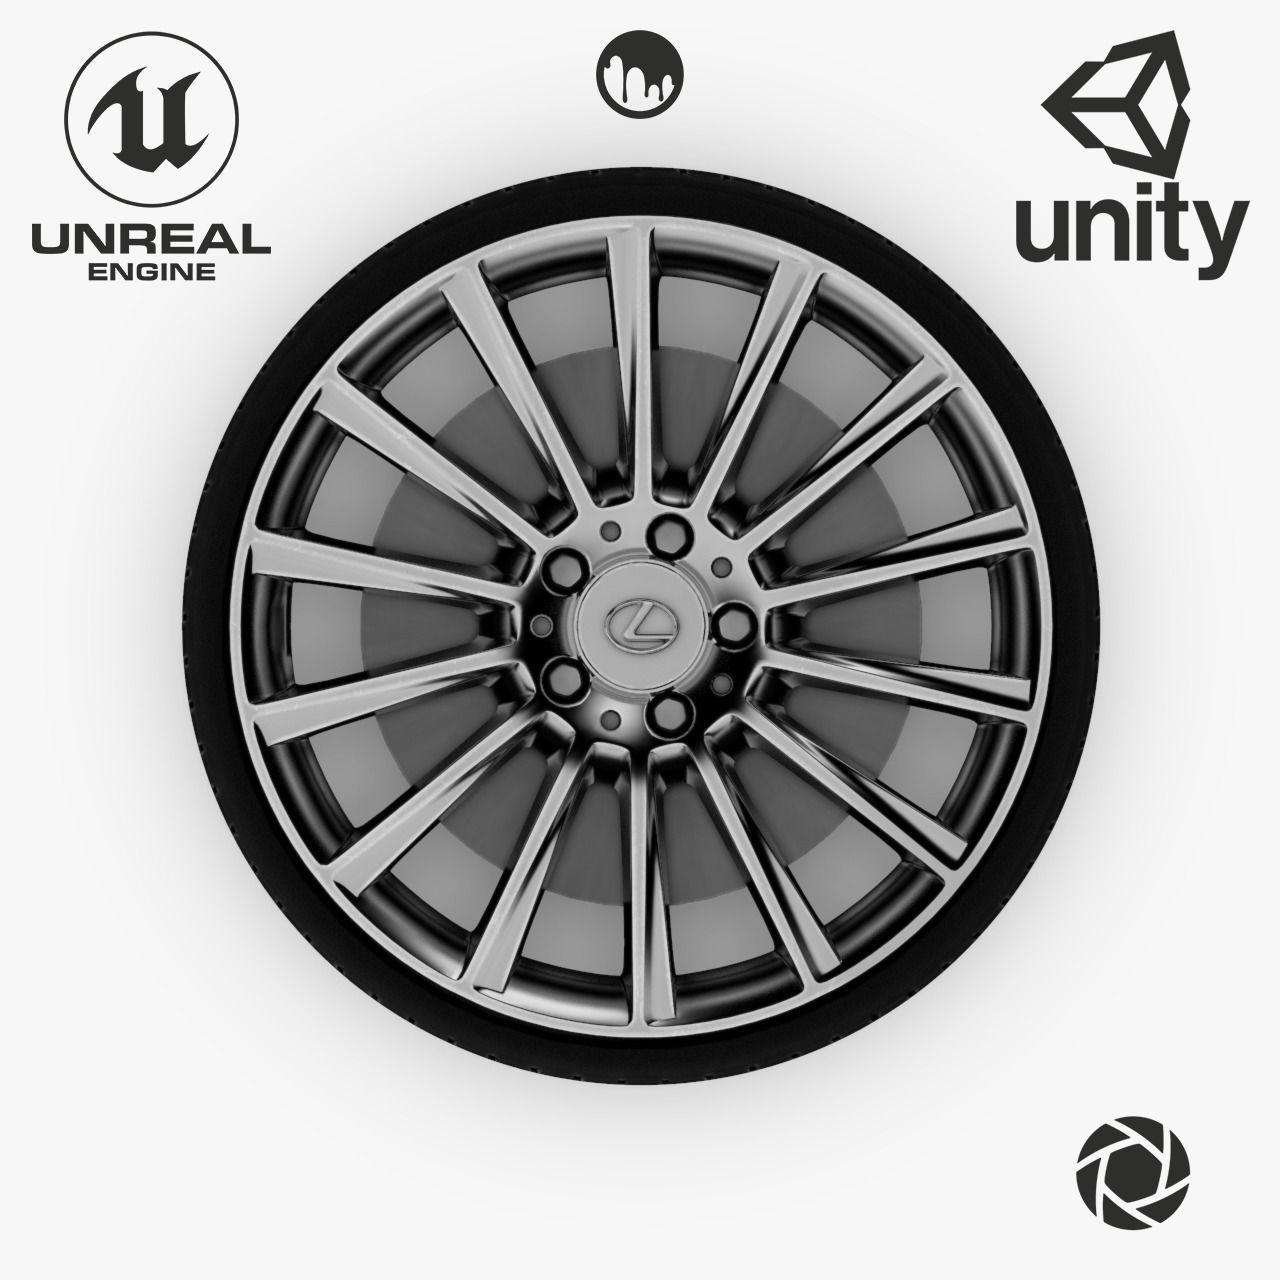 Wheel Steel-Chrome Alloy Rim Lexus 19 inch Michelin based Tire